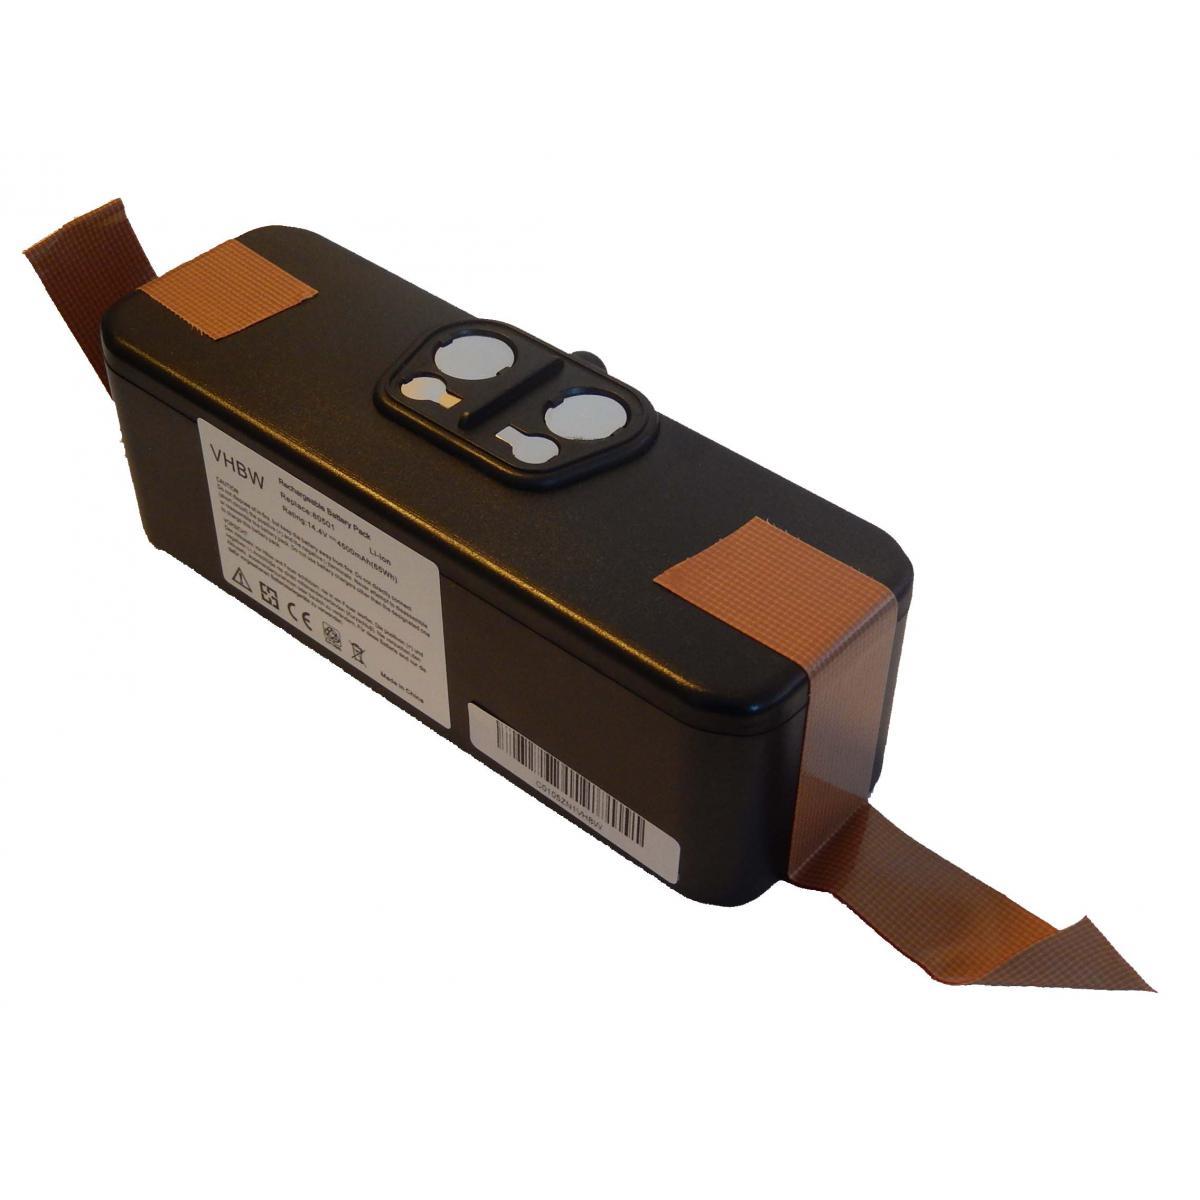 Vhbw vhbw® Batterie de rechange Li-Ion 4500mAh (14.4V) compatible avec iRobot Roomba des séries 500, 600, 700, 800, 900